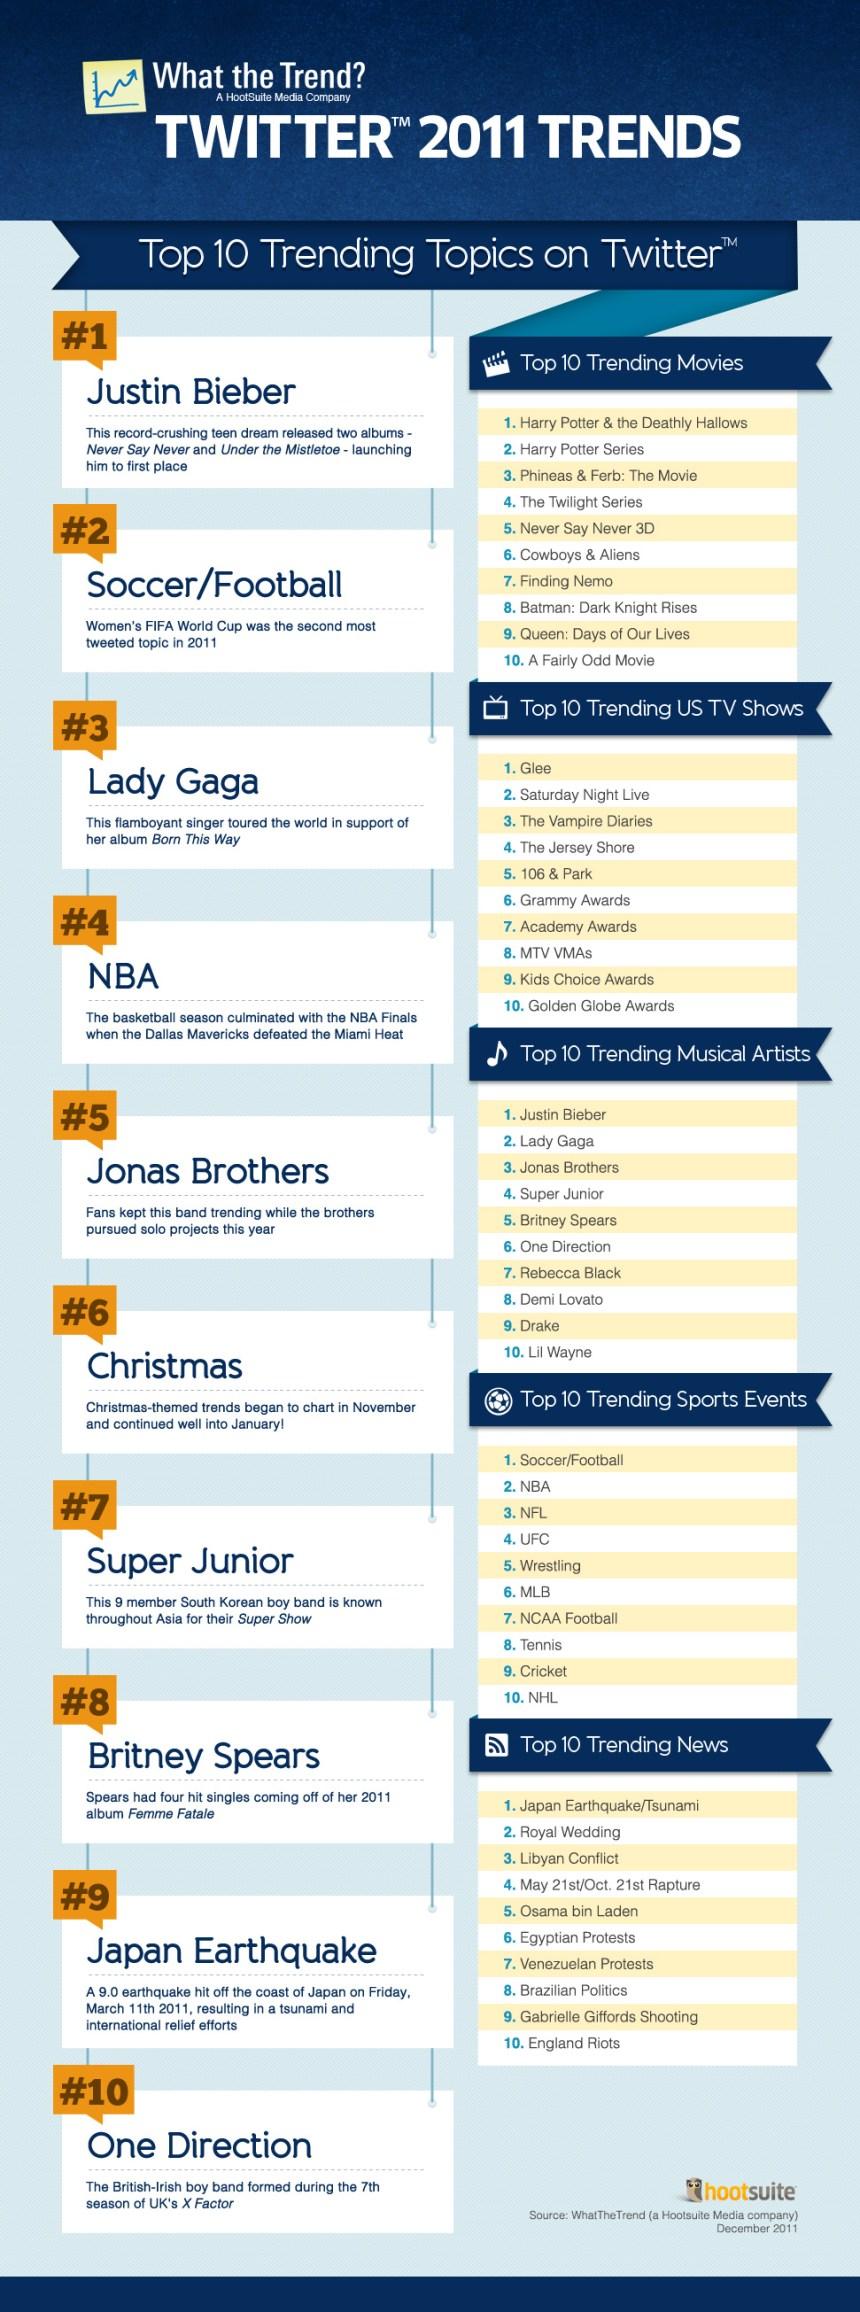 Top 10 tendencias en Twitter durante 2011